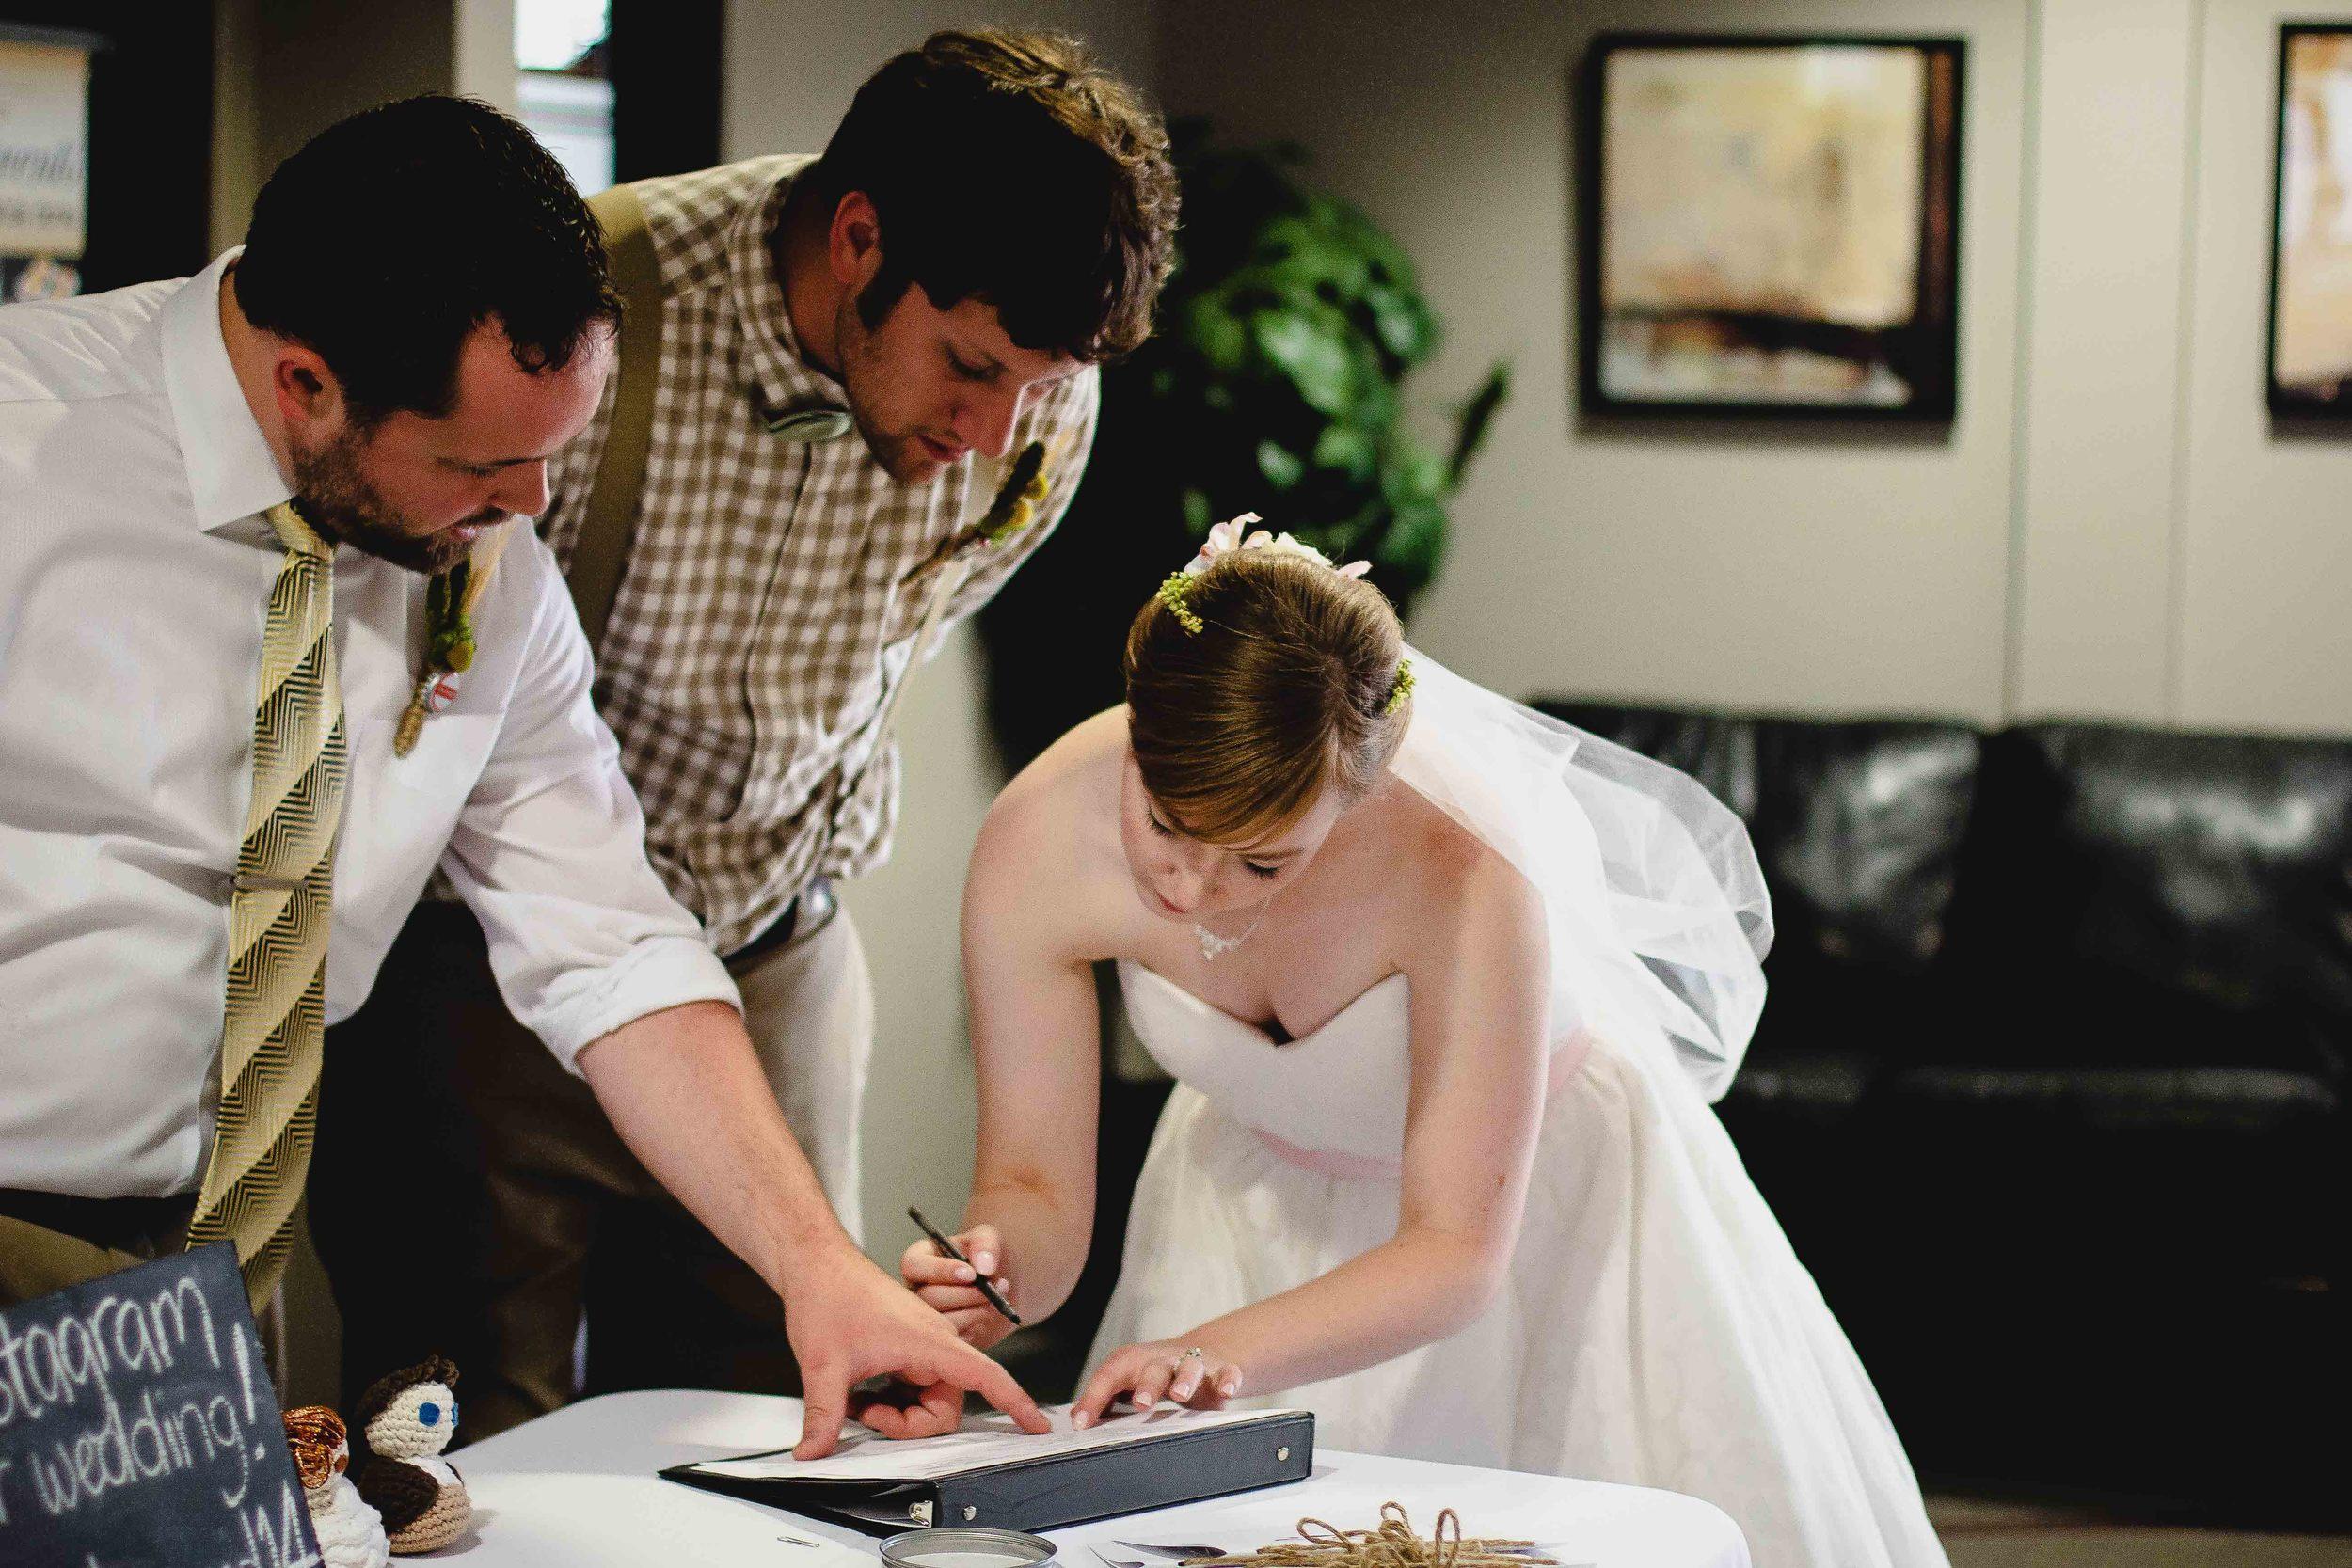 abcde wedding (107).jpg